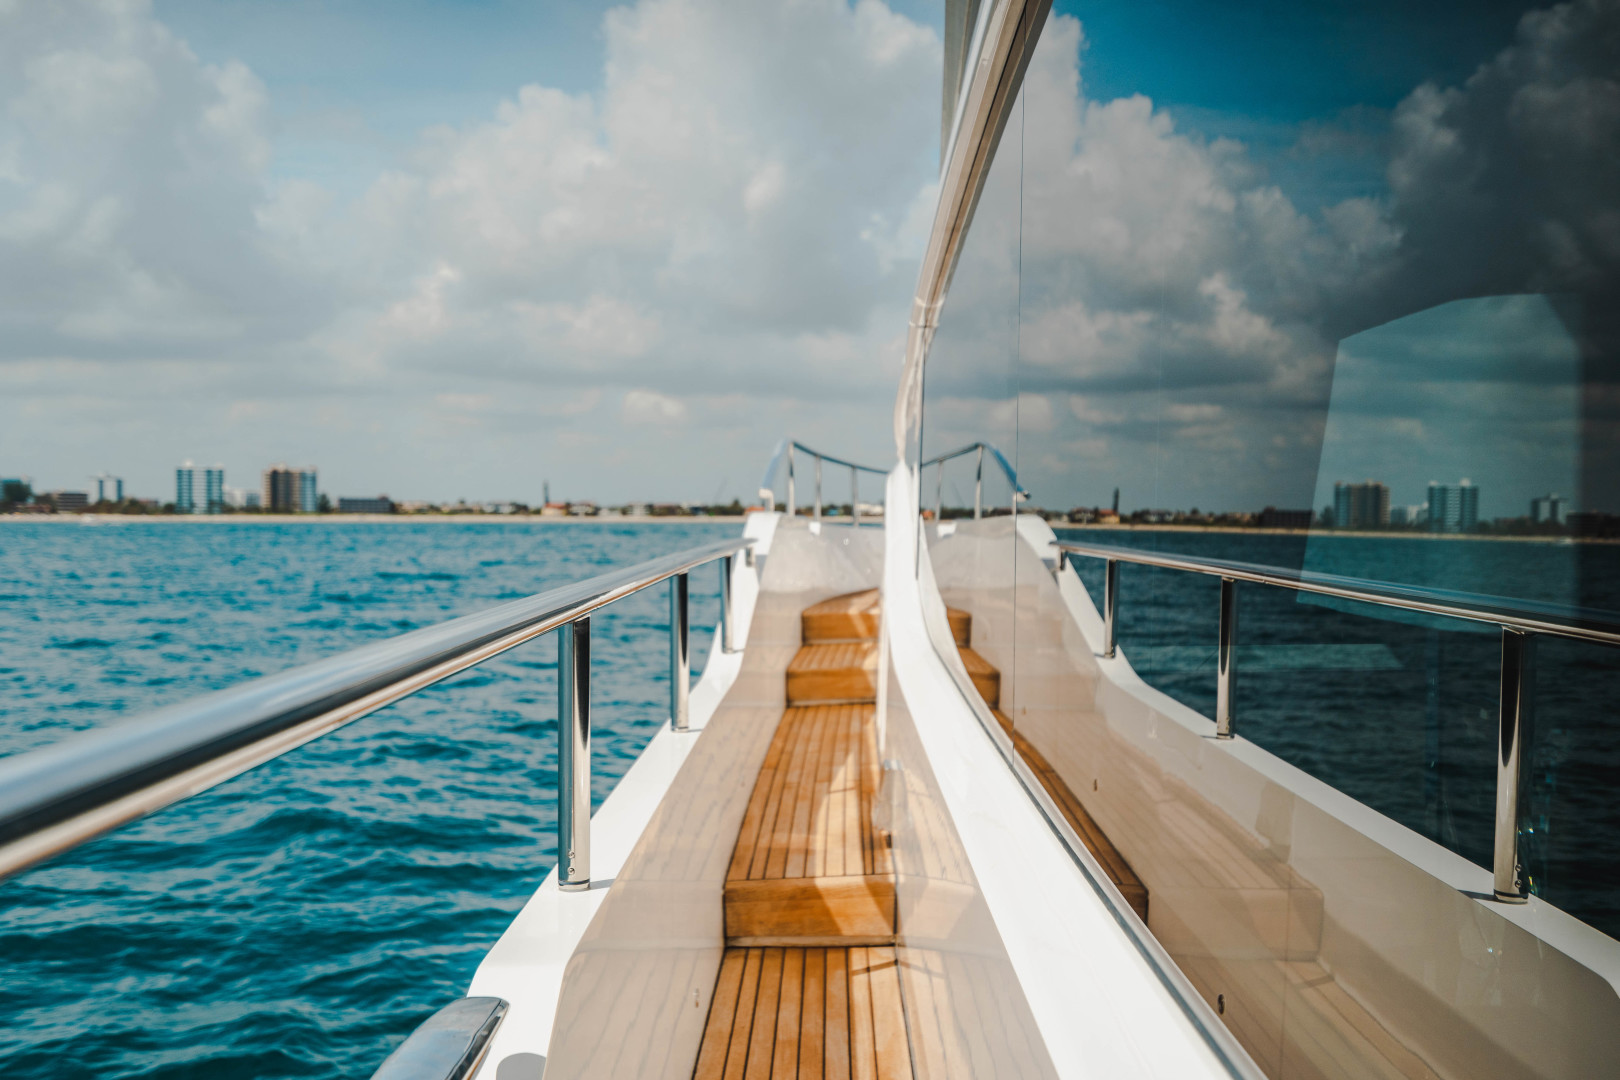 Princess-Y85  2019-Splash Delray Beach-Florida-United States-1631619 | Thumbnail